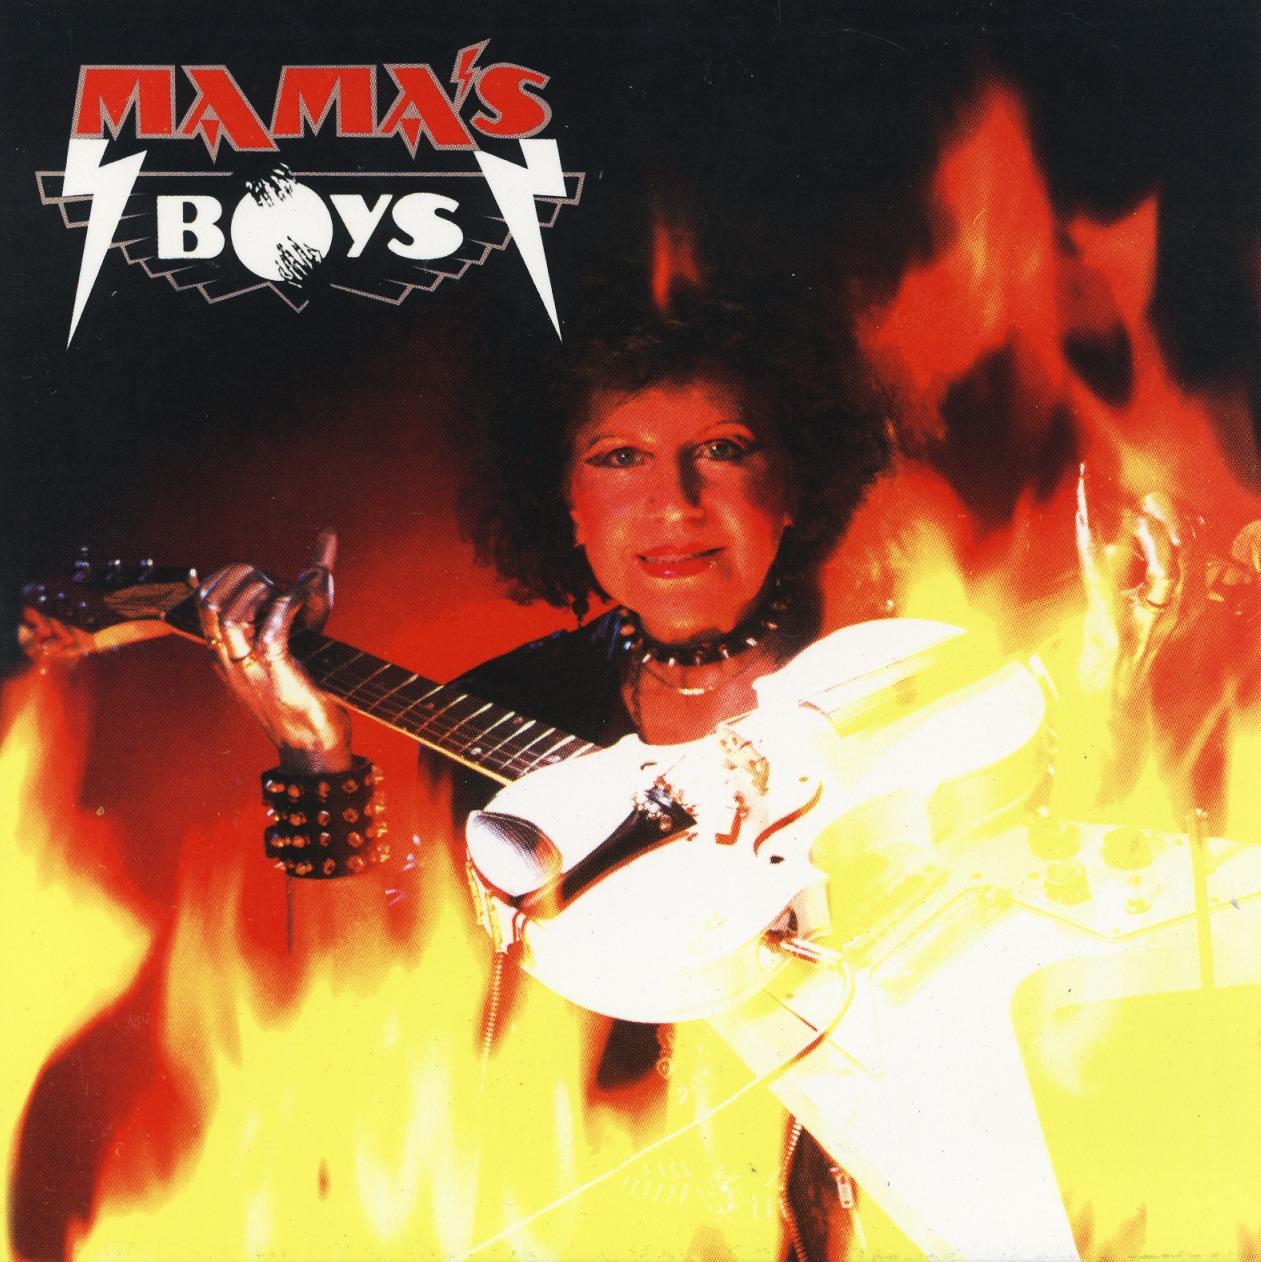 MAMA'S BOYS (Ireland) / Mama's Boys (collector's item)